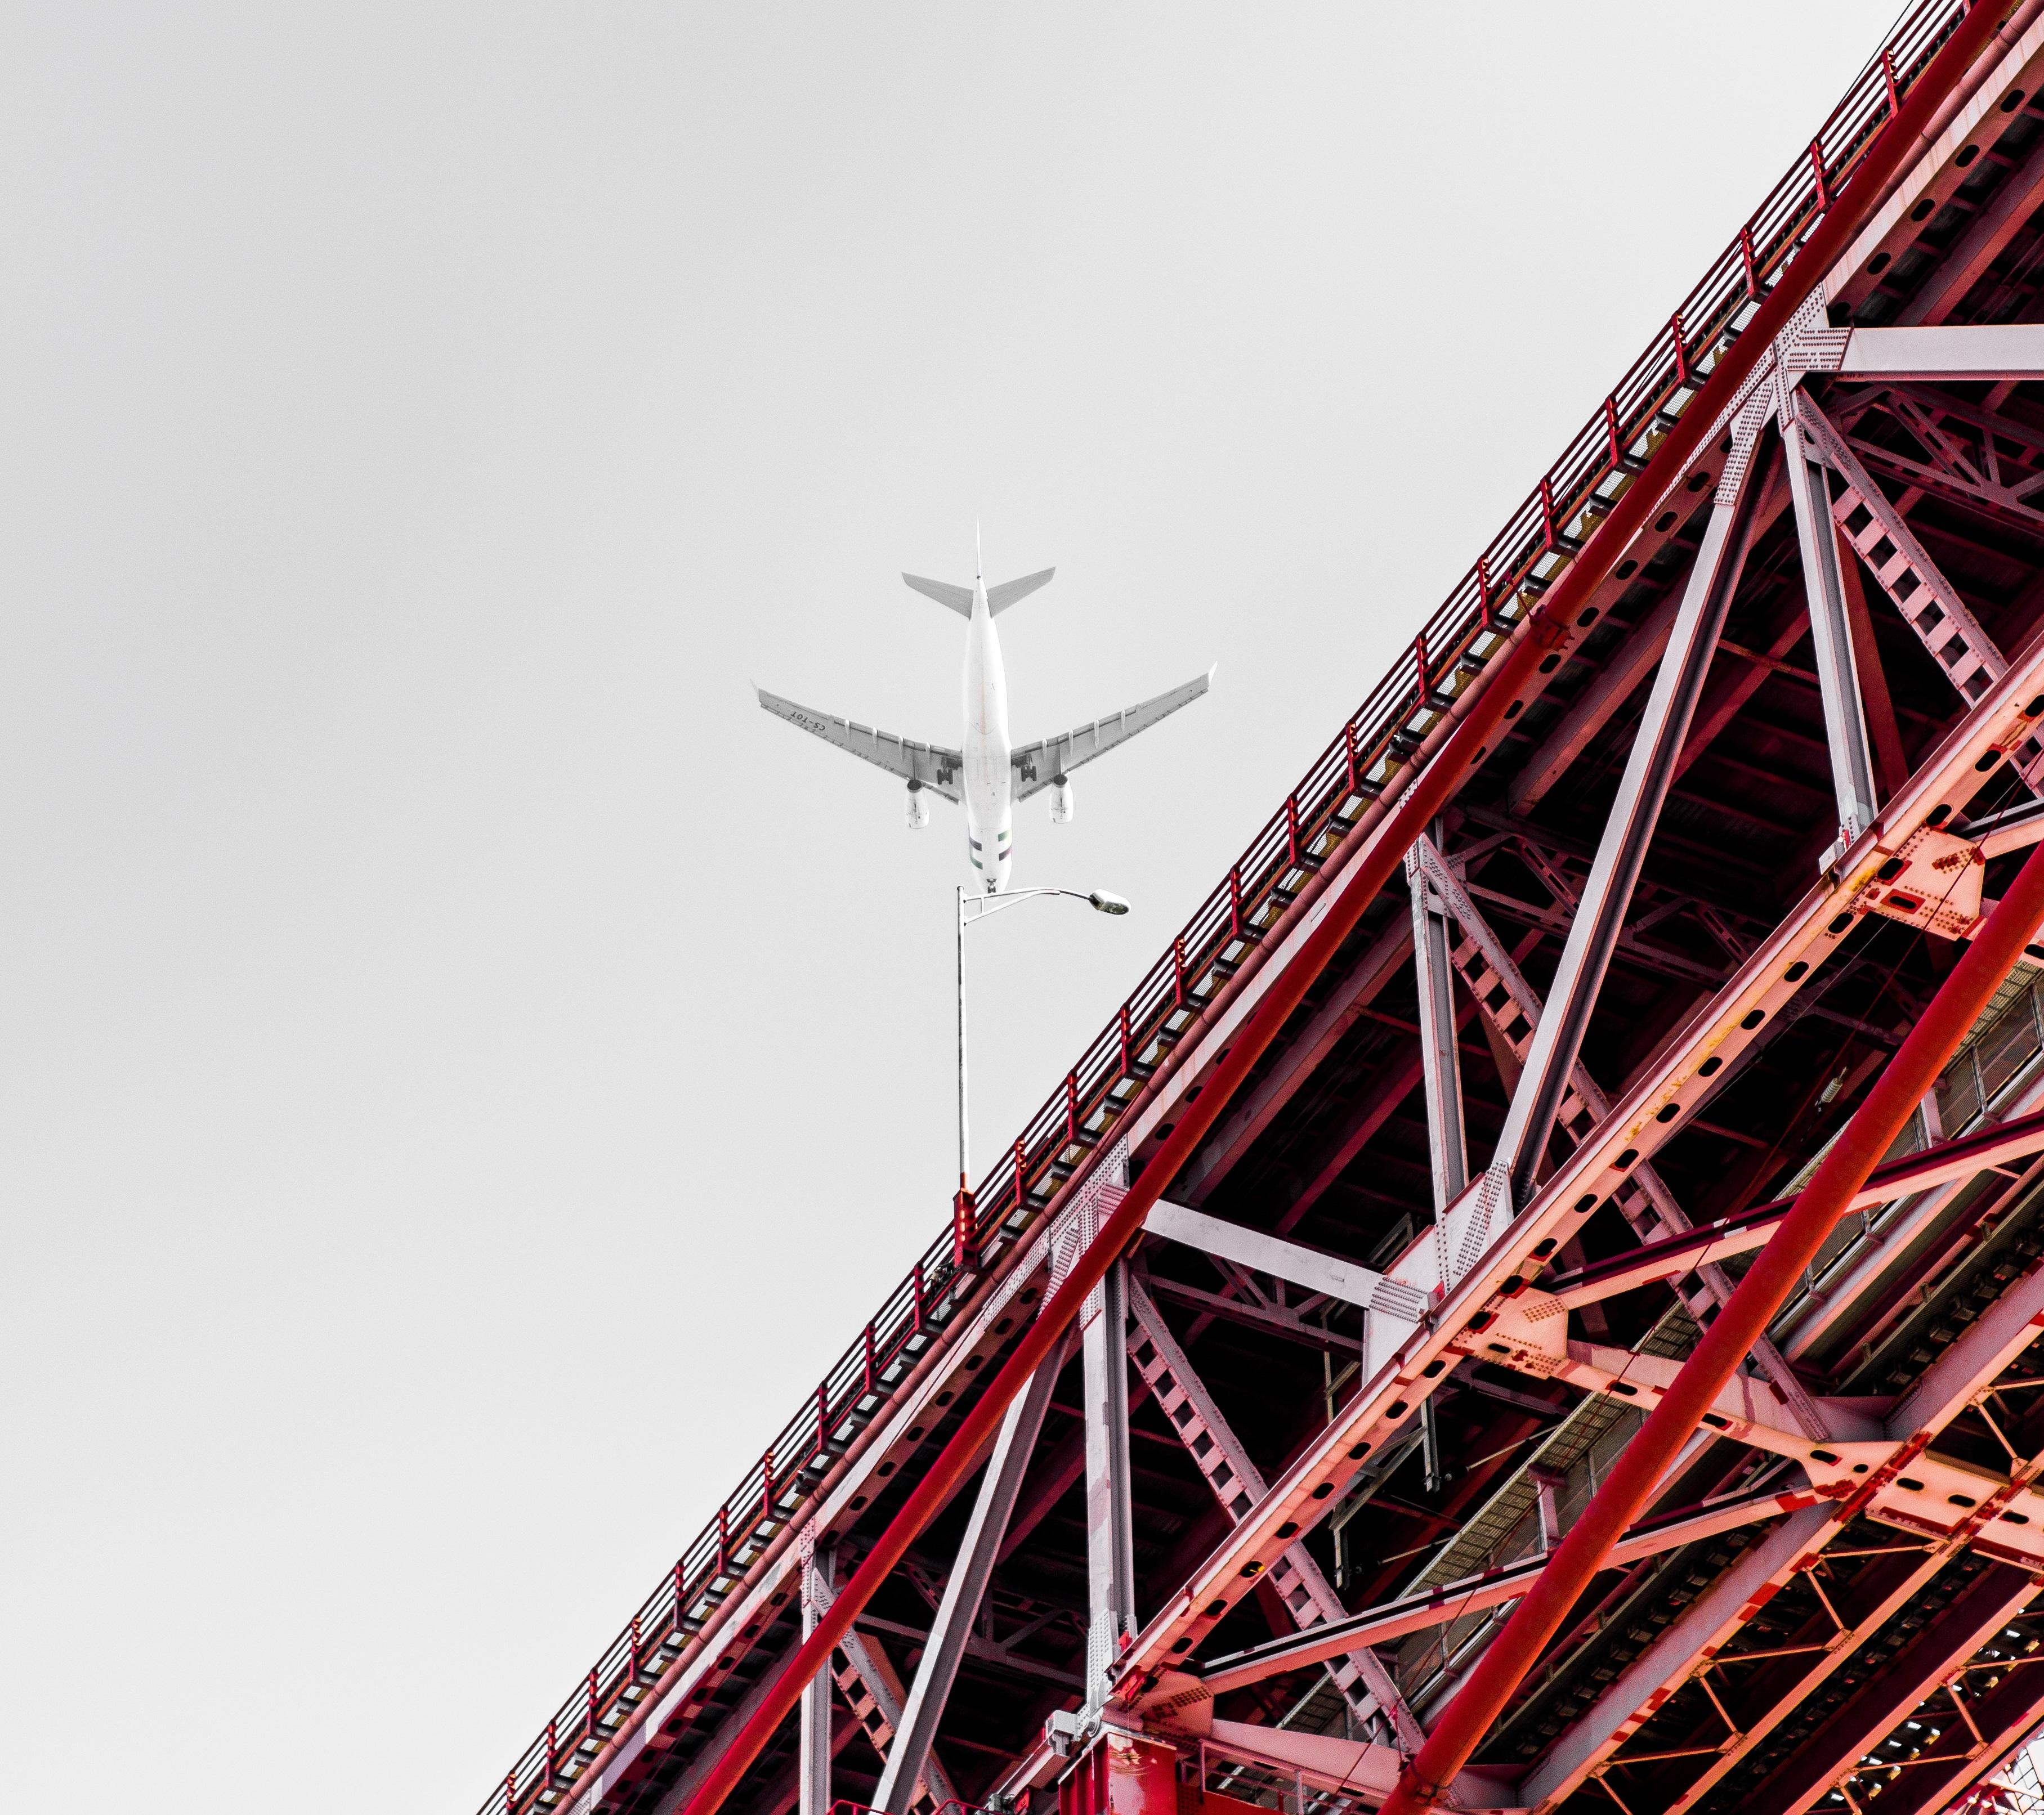 transport and bridge image